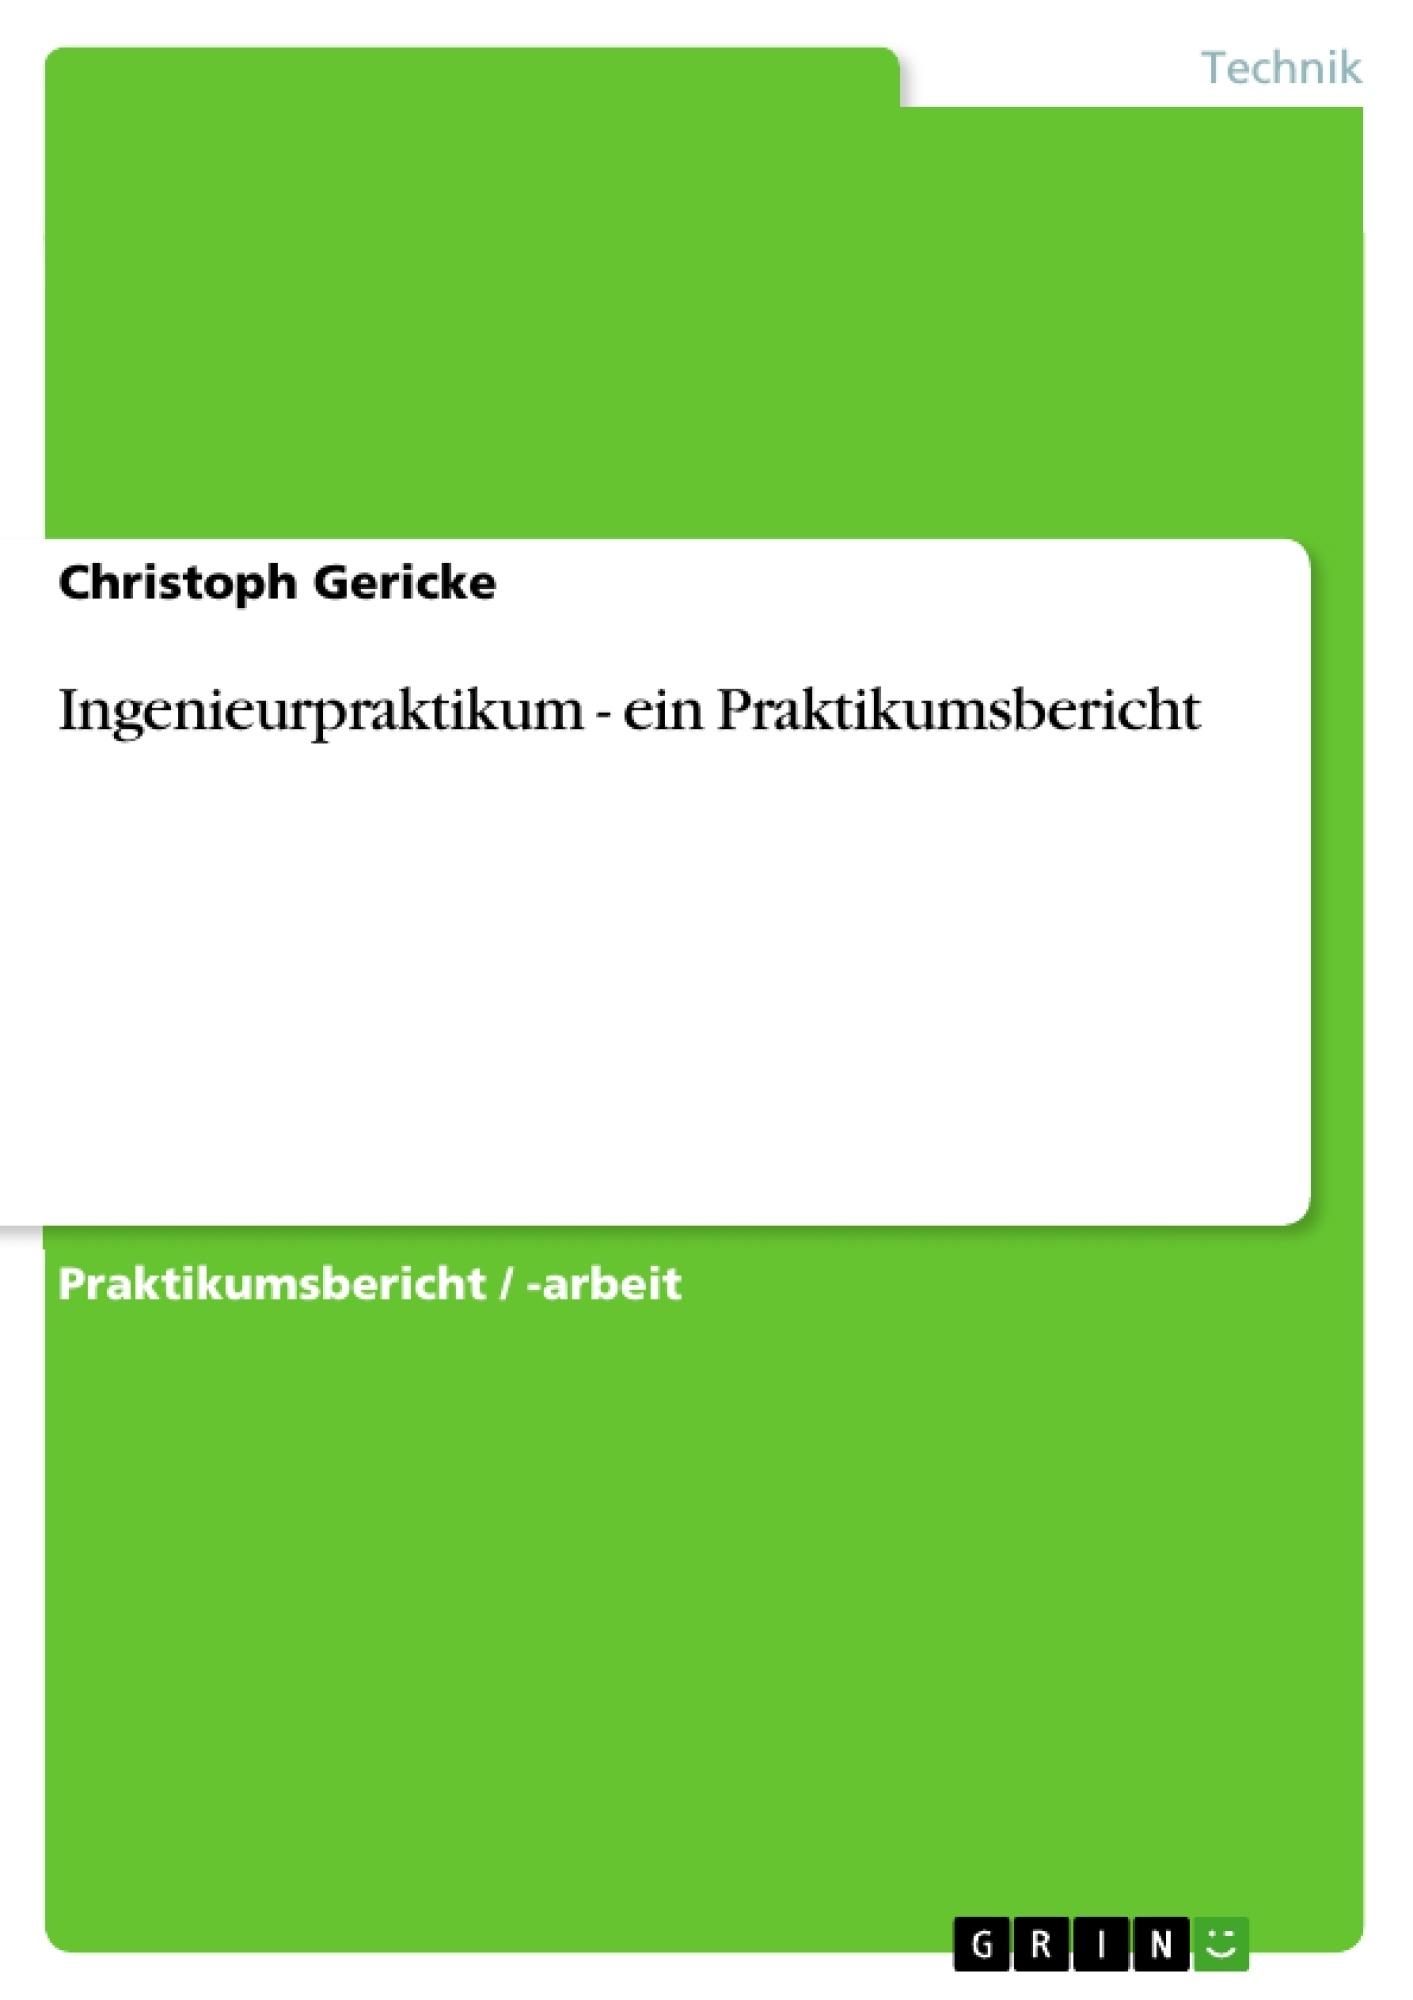 Titel: Ingenieurpraktikum - ein Praktikumsbericht